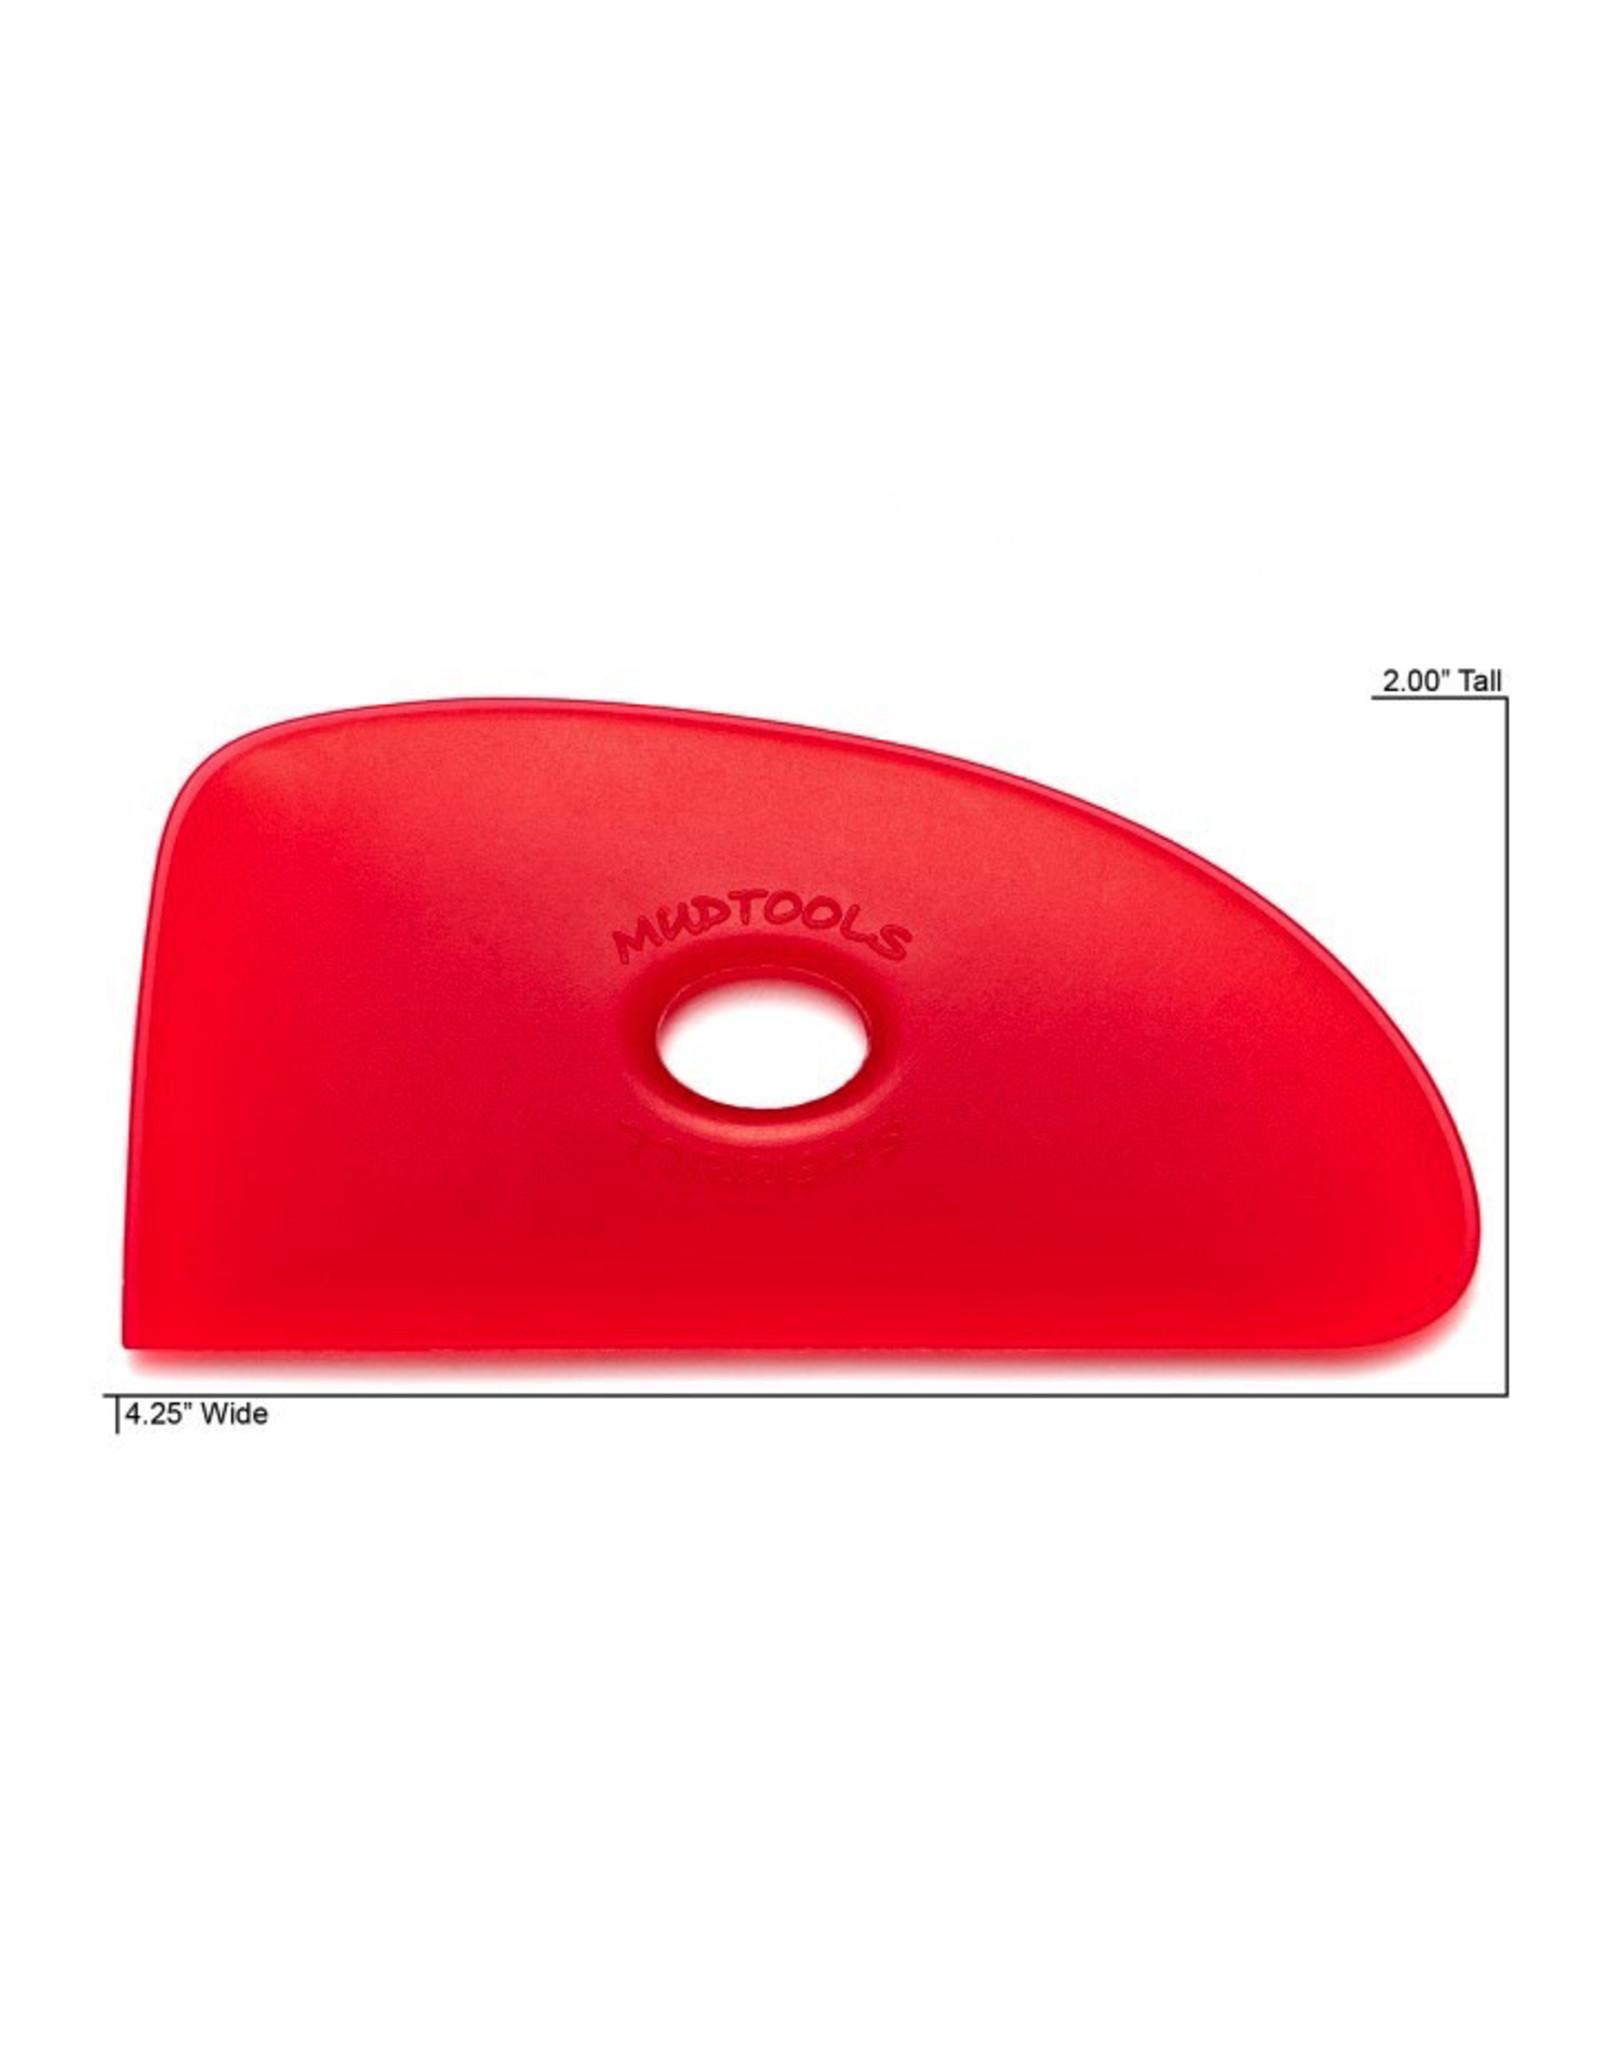 Mudtools RIb 4 (Red)